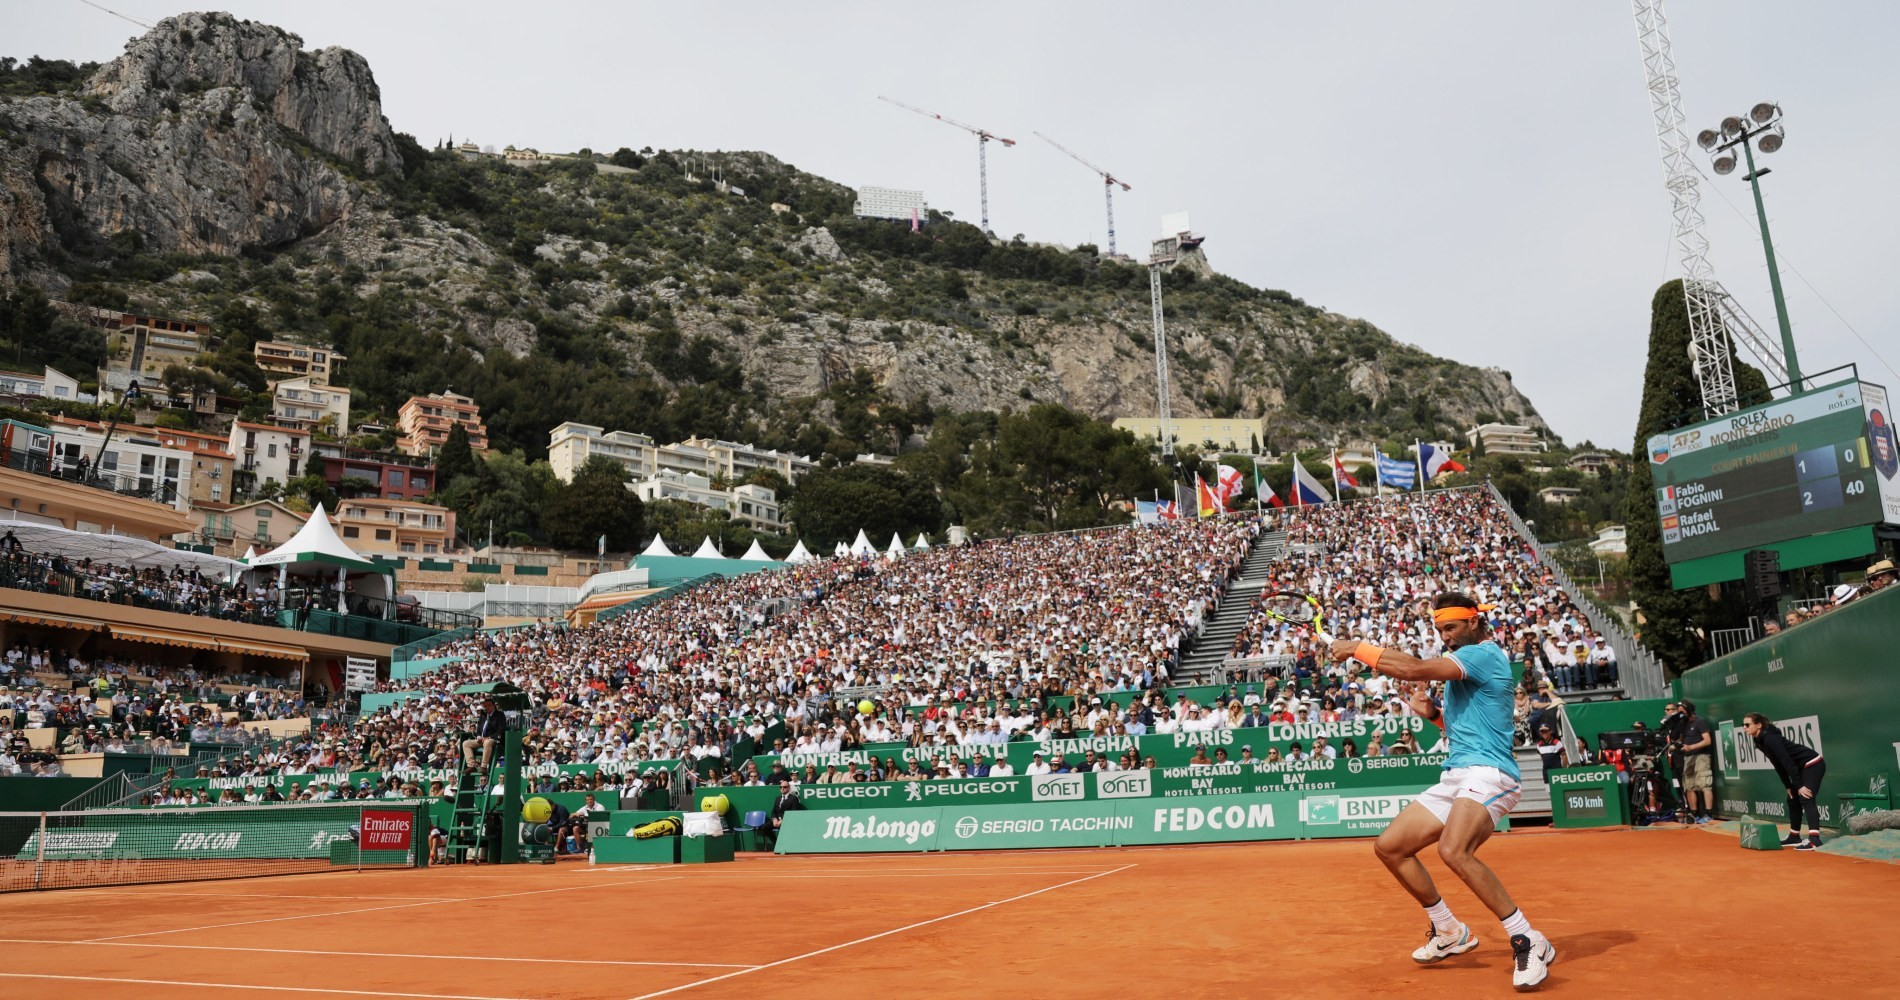 Rafael Nadal in action in Monte Carlo